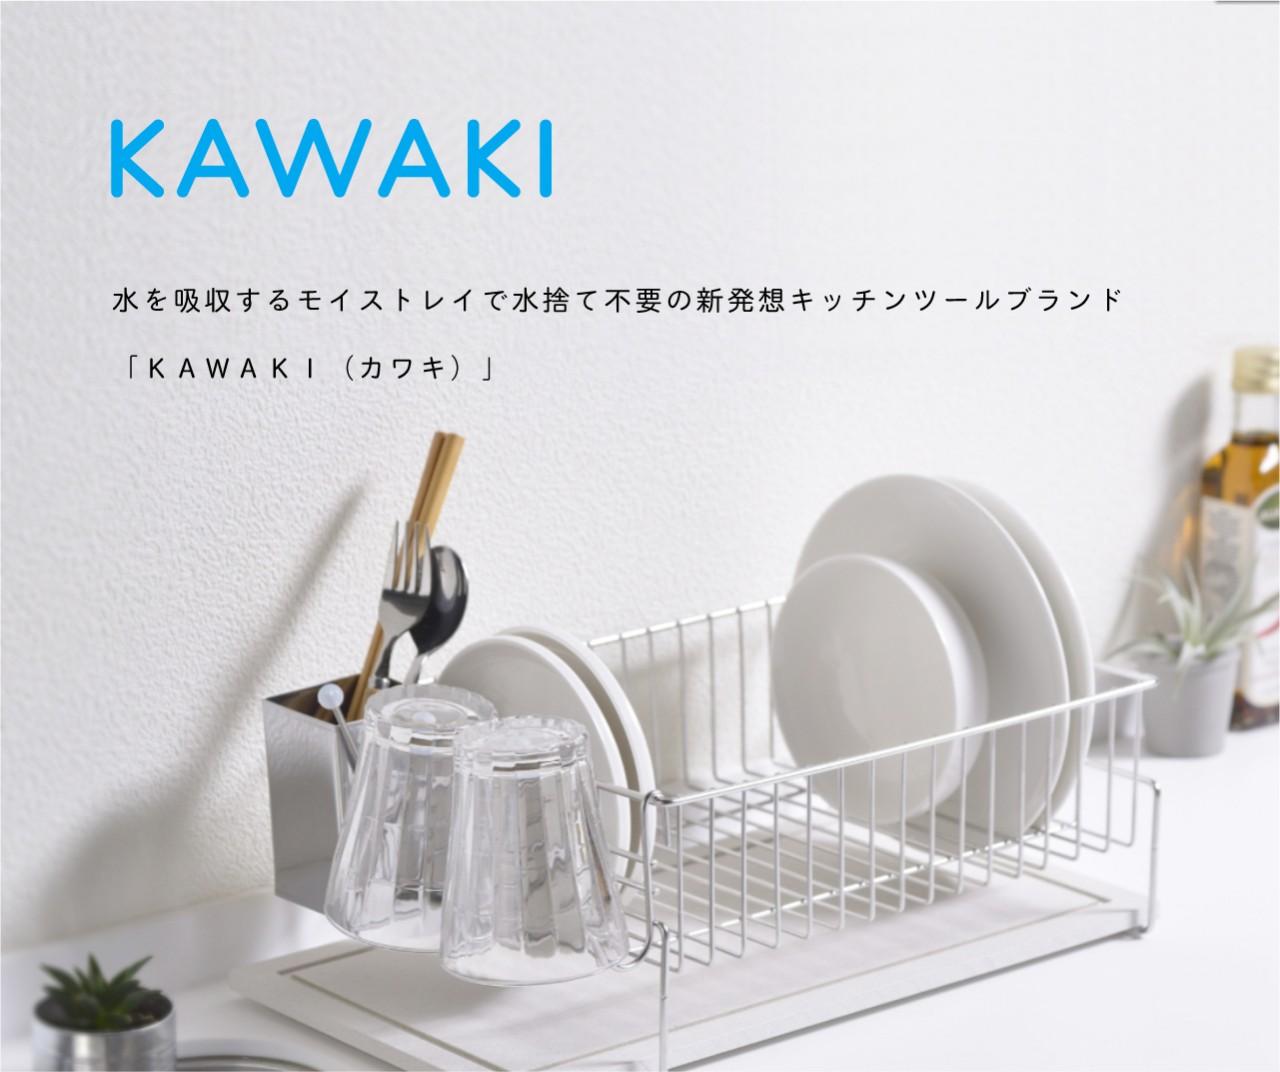 KAWAKI